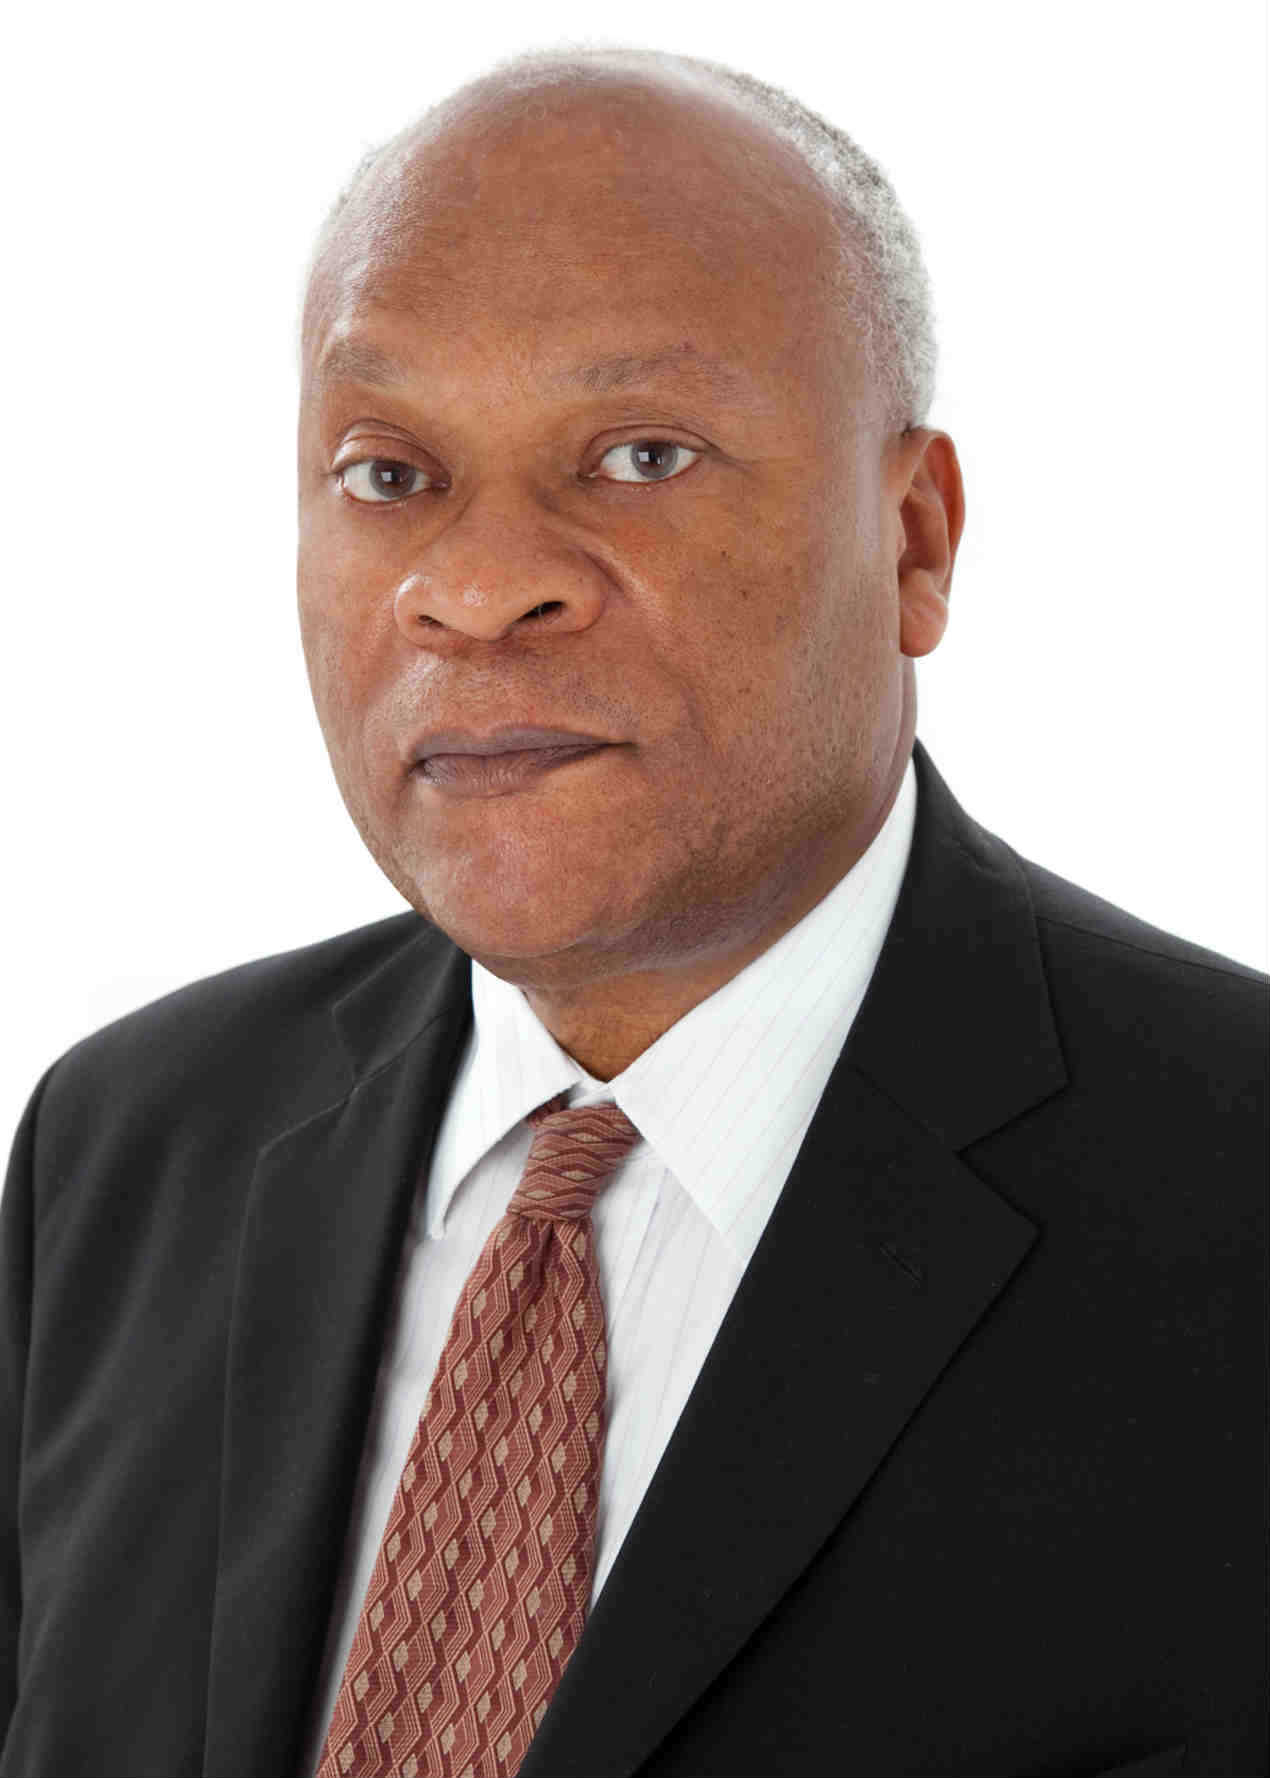 Delbert Sandiford Workplace Matters' Chairman.